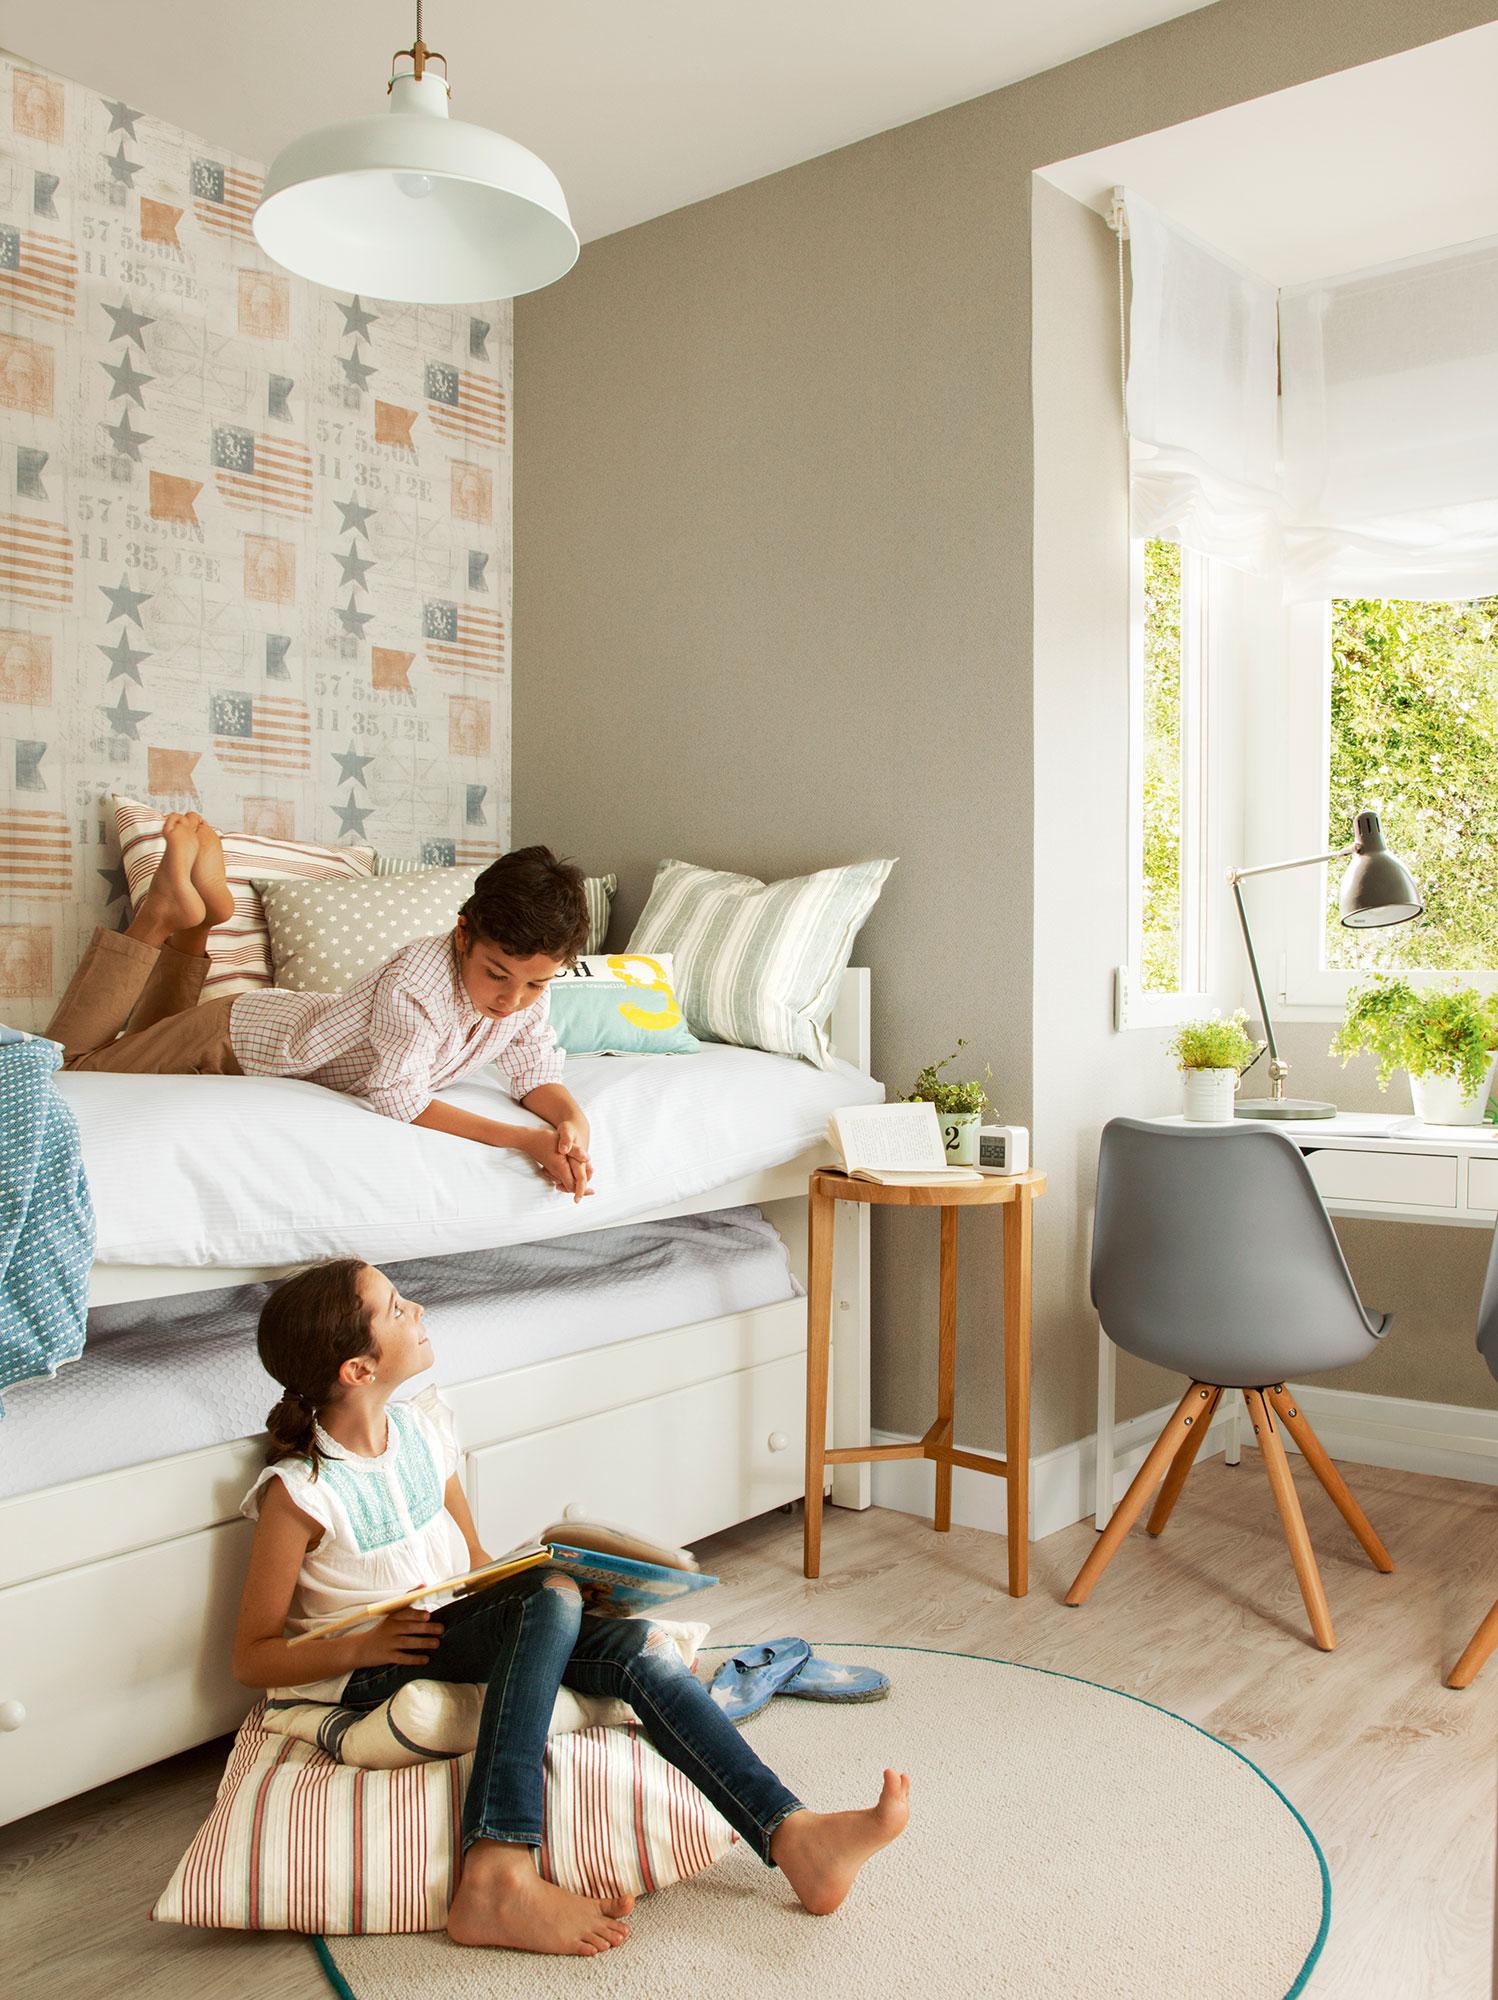 Decora la habitaci n infantil con papel pintado - Decorar habitacion infantil nina ...